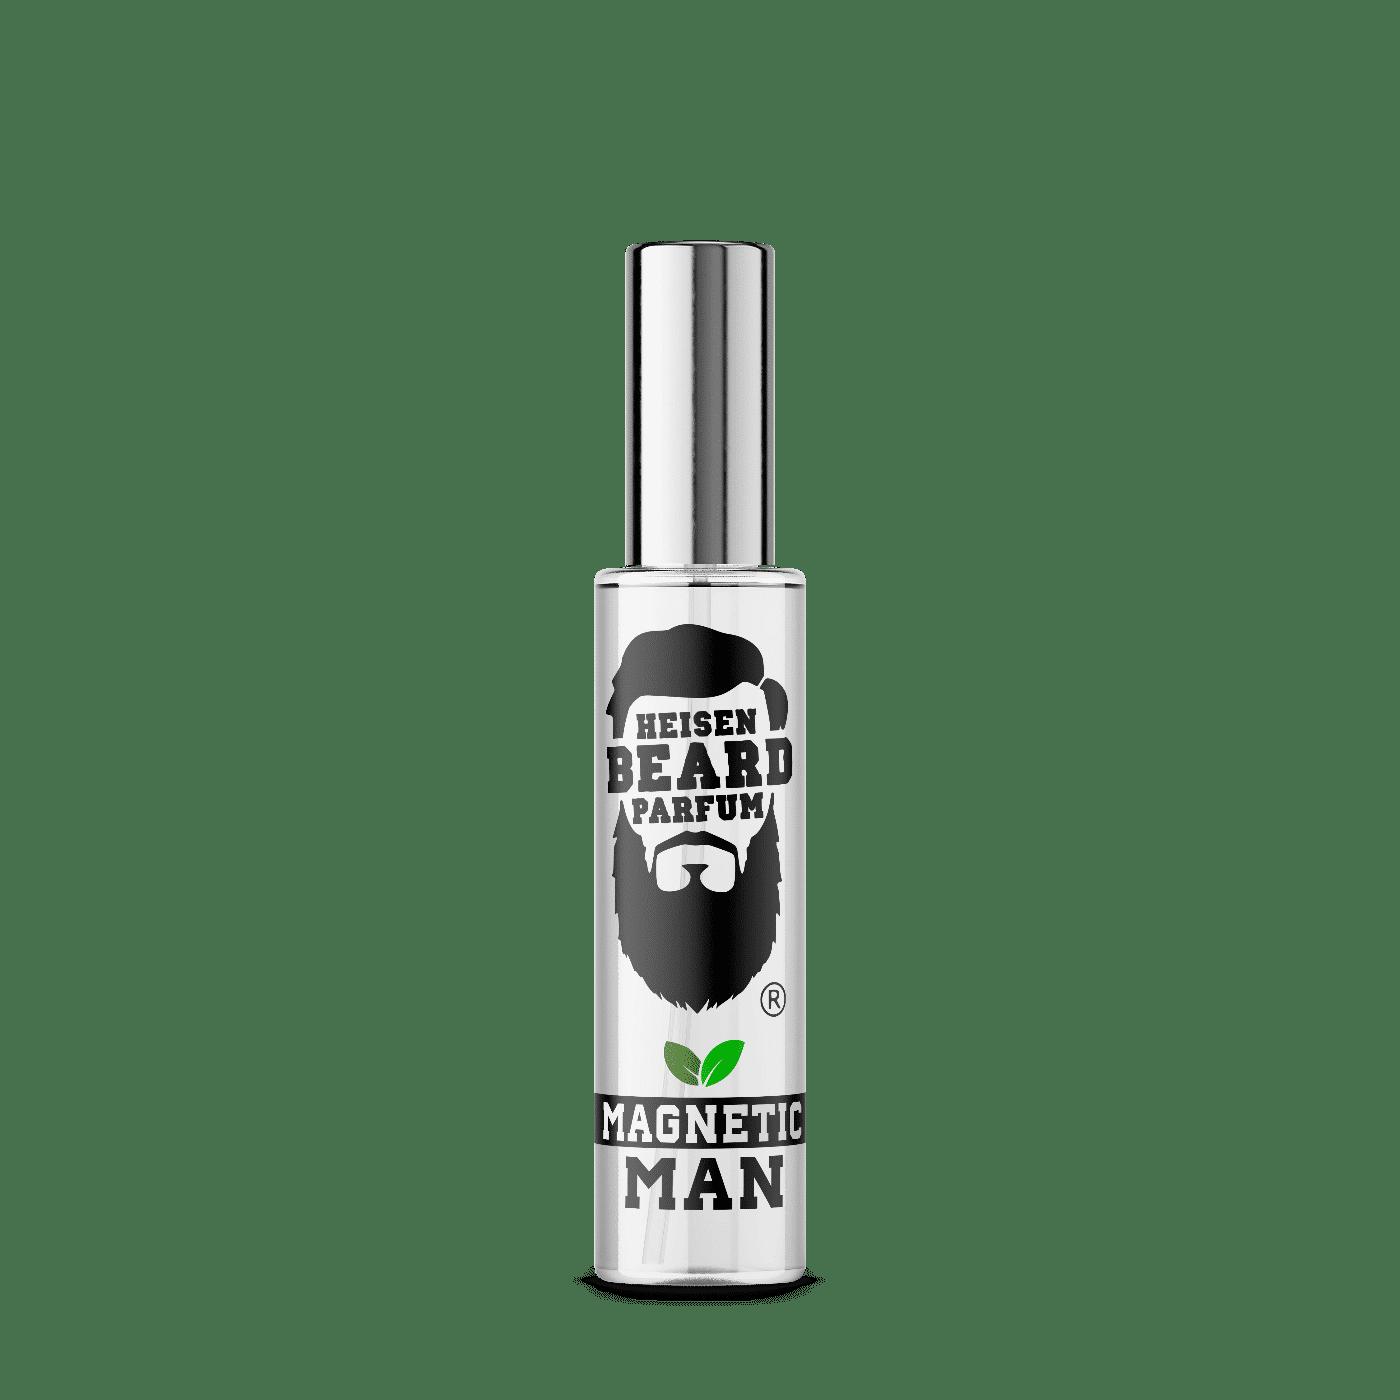 Heisenbeard - Eau de Parfum - Magnetic Man - 50ml - fruchtig & süß